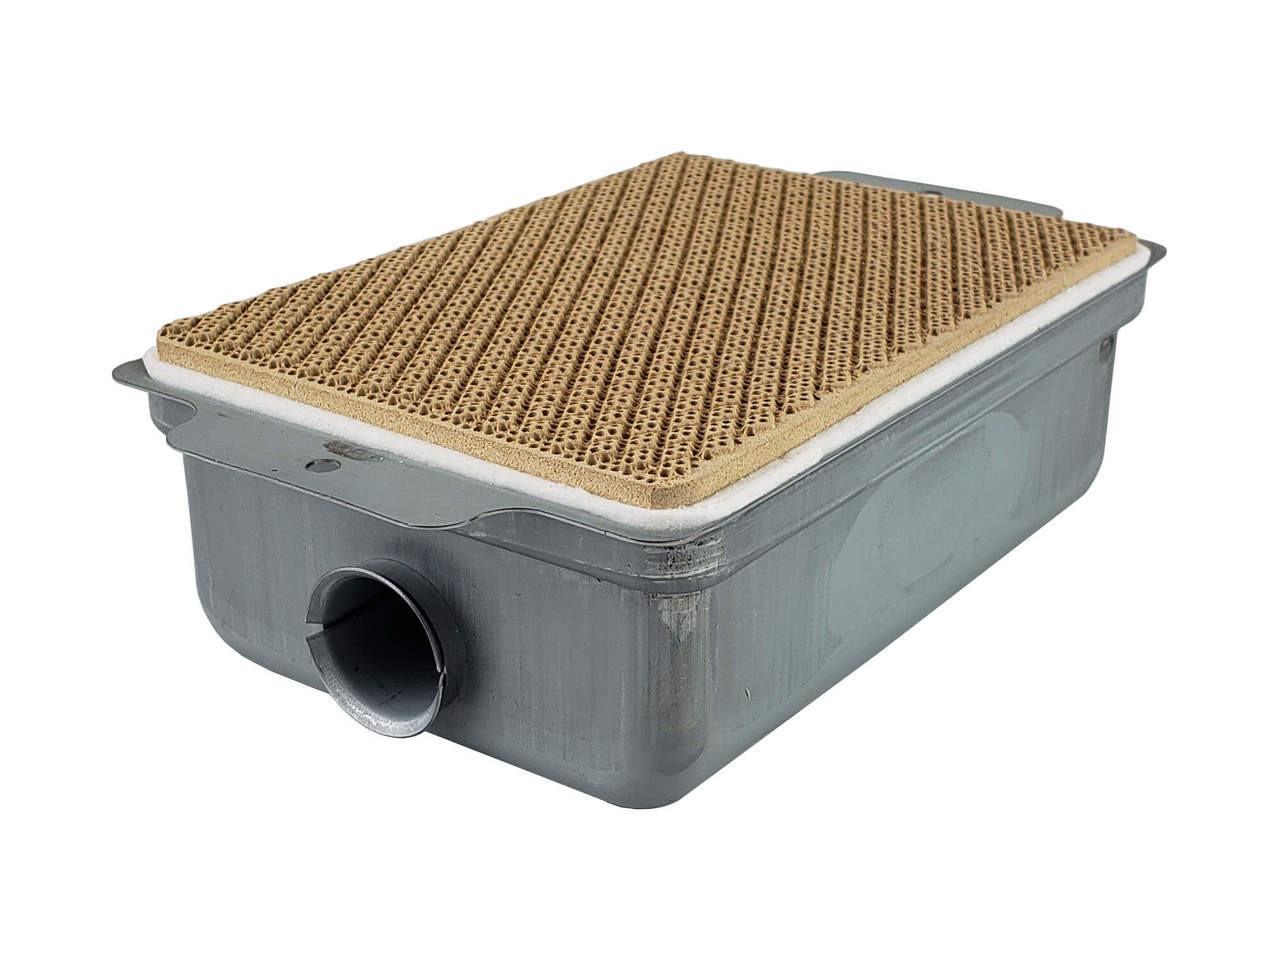 Bromic  patio heater burner front